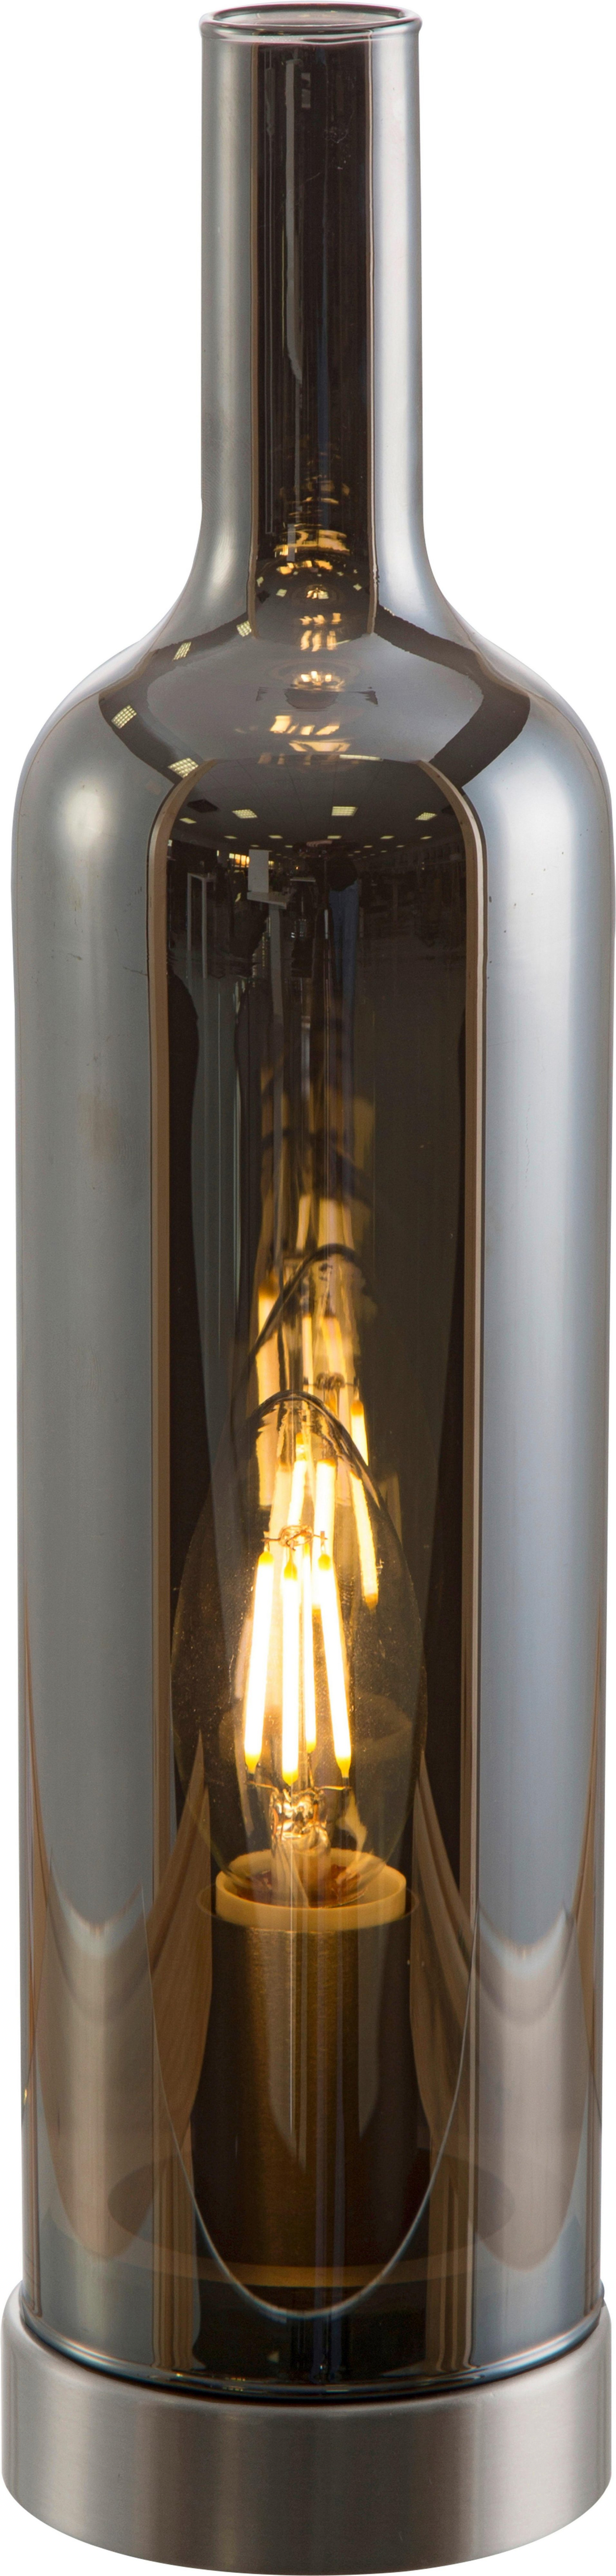 Nino Leuchten,LED Tischleuchte BOTTLE